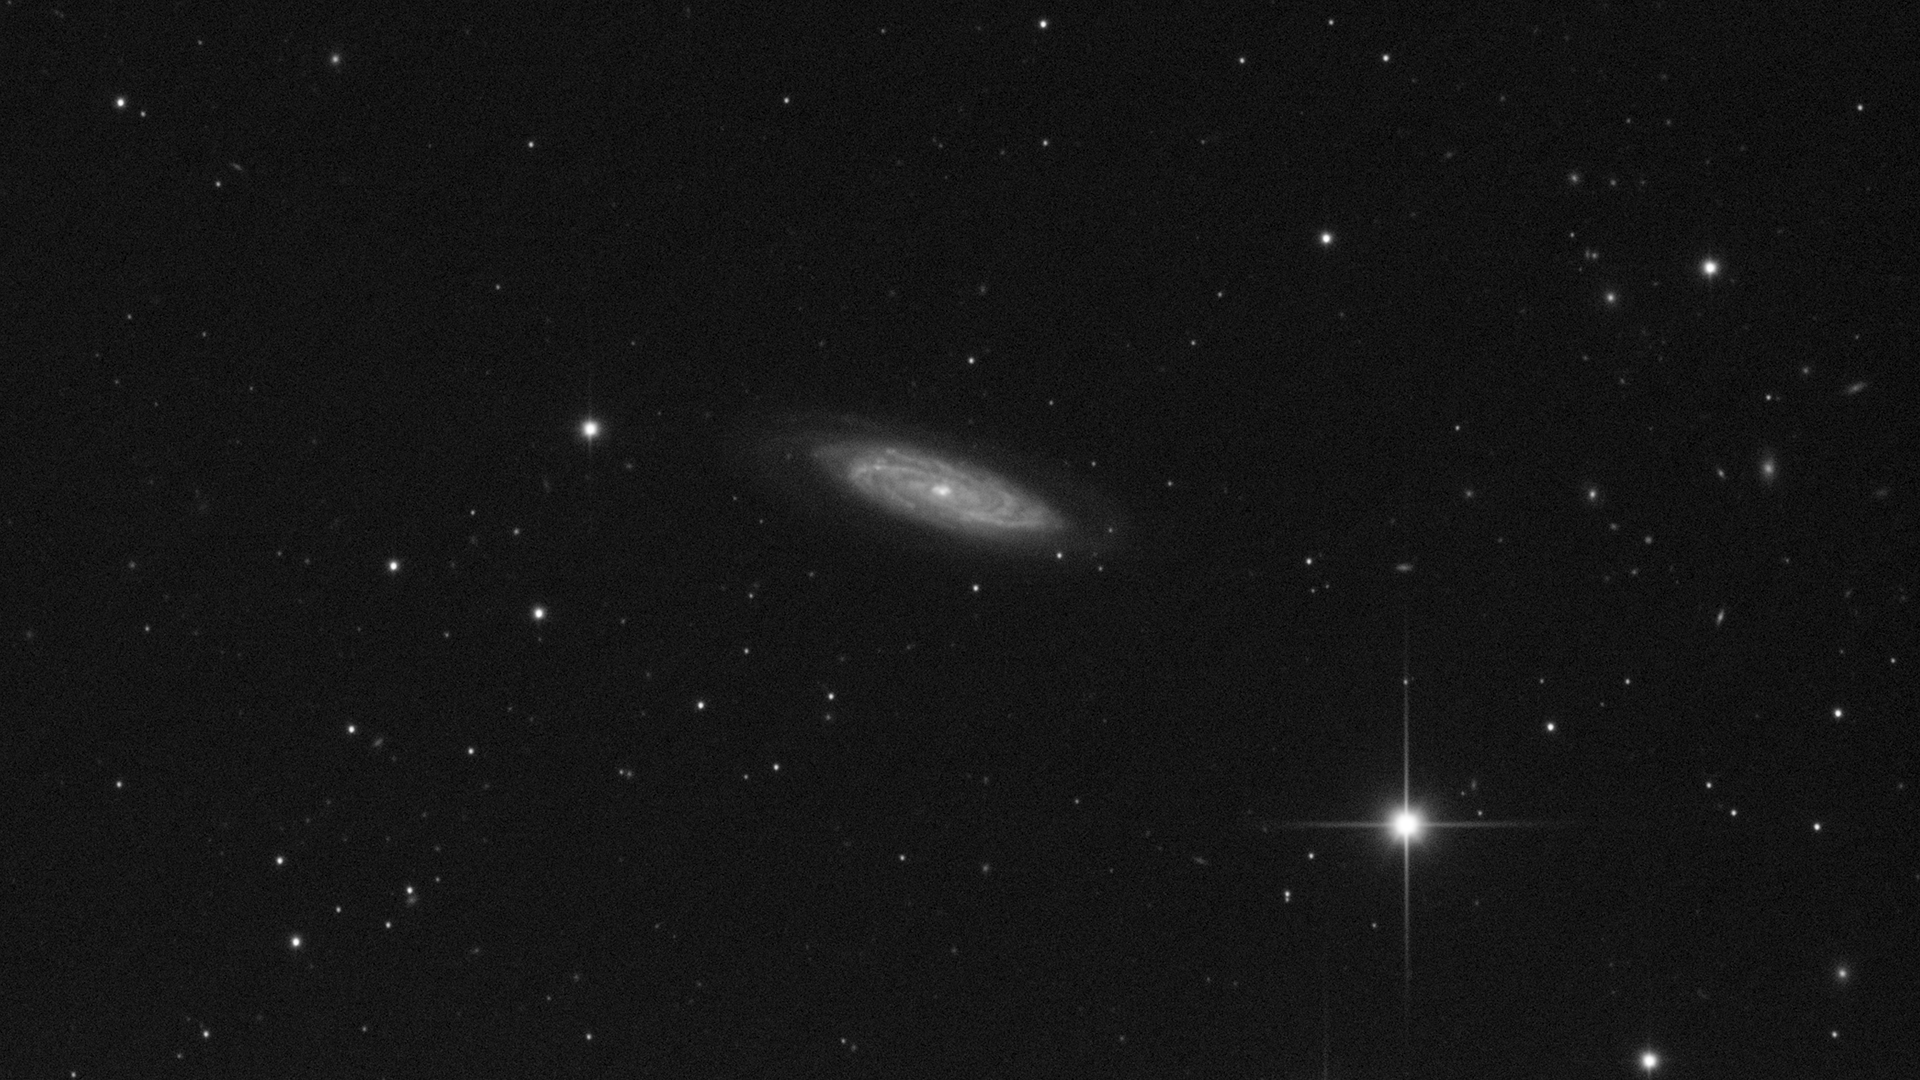 r_pp_NGC4100_stacked.png.15f12b8b1dd81fe1af752e99b7b4185c.png